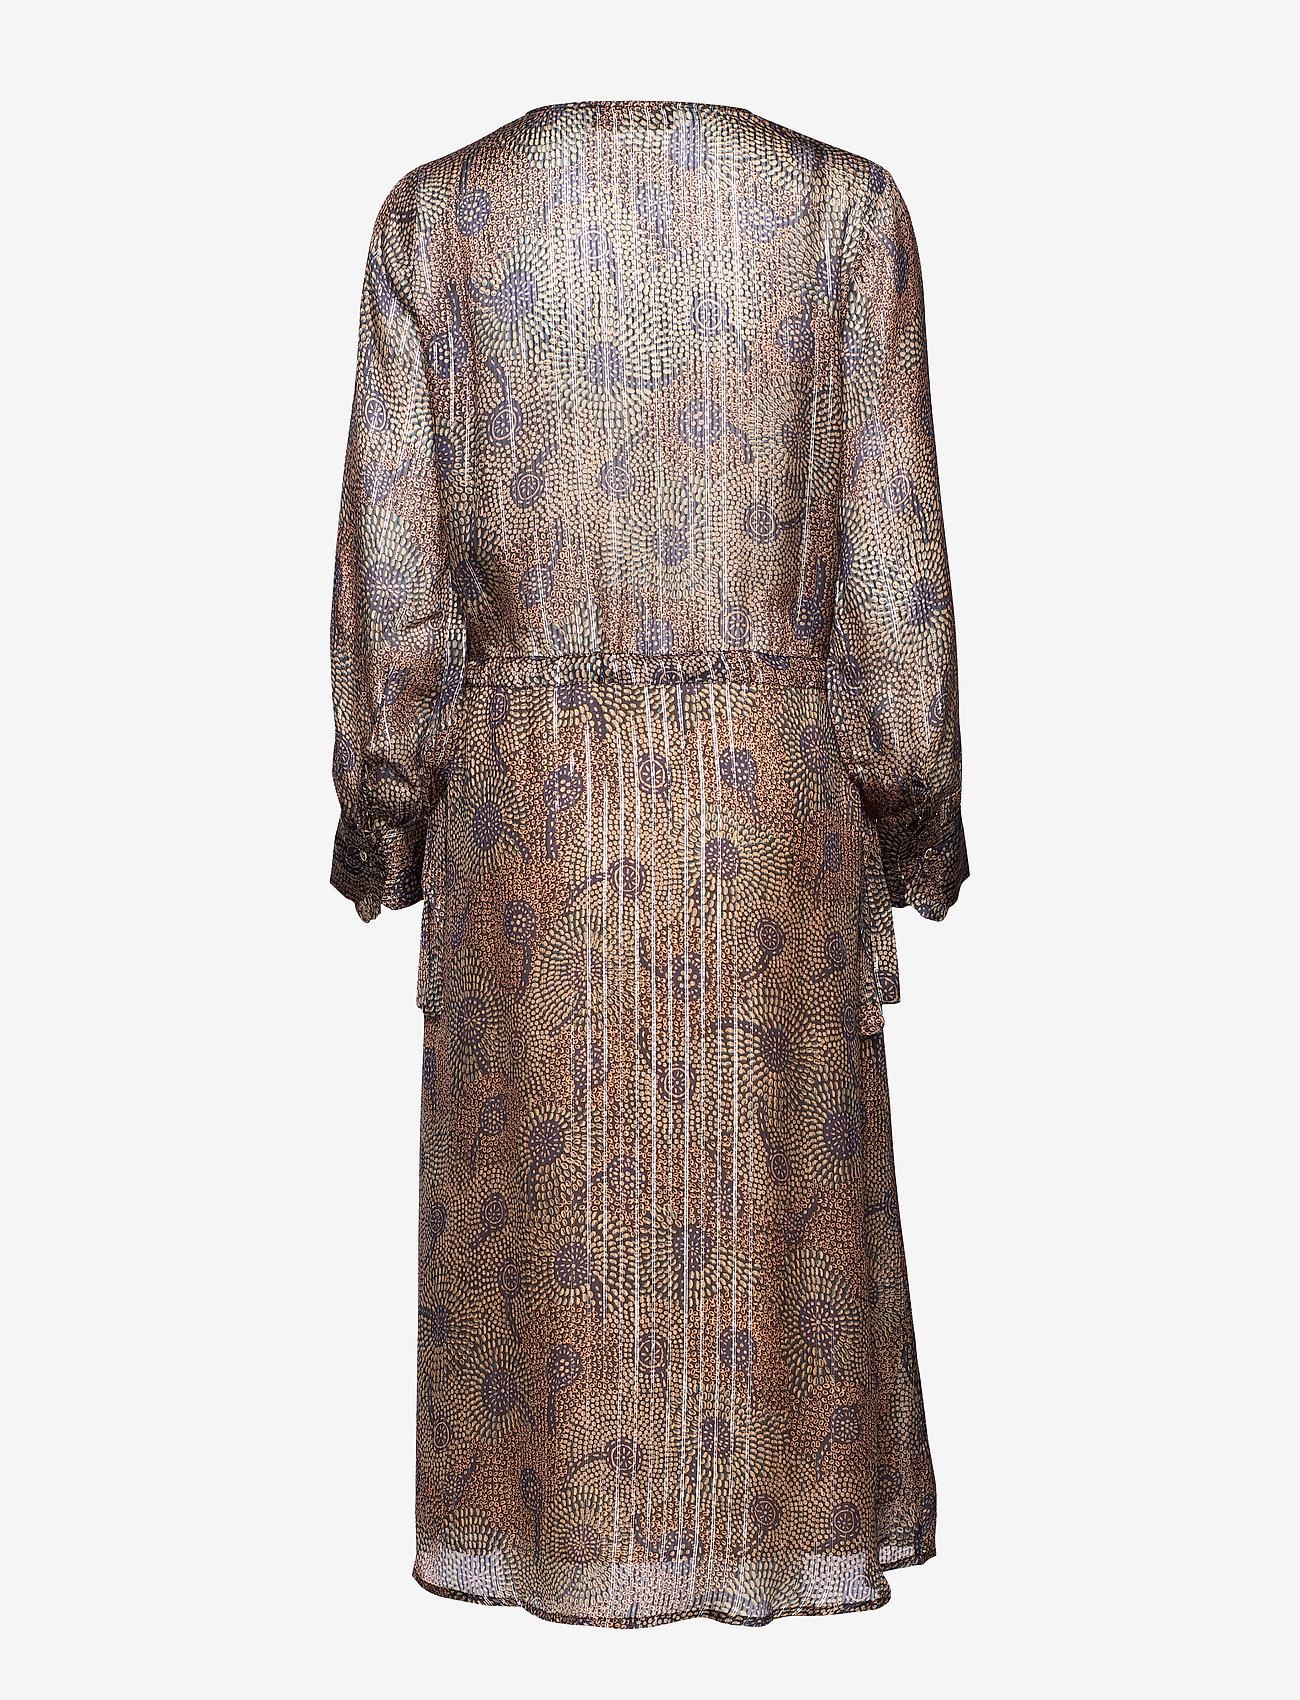 MOS MOSH Chita Peacock Dress - Dresses PEACOCK PRINT